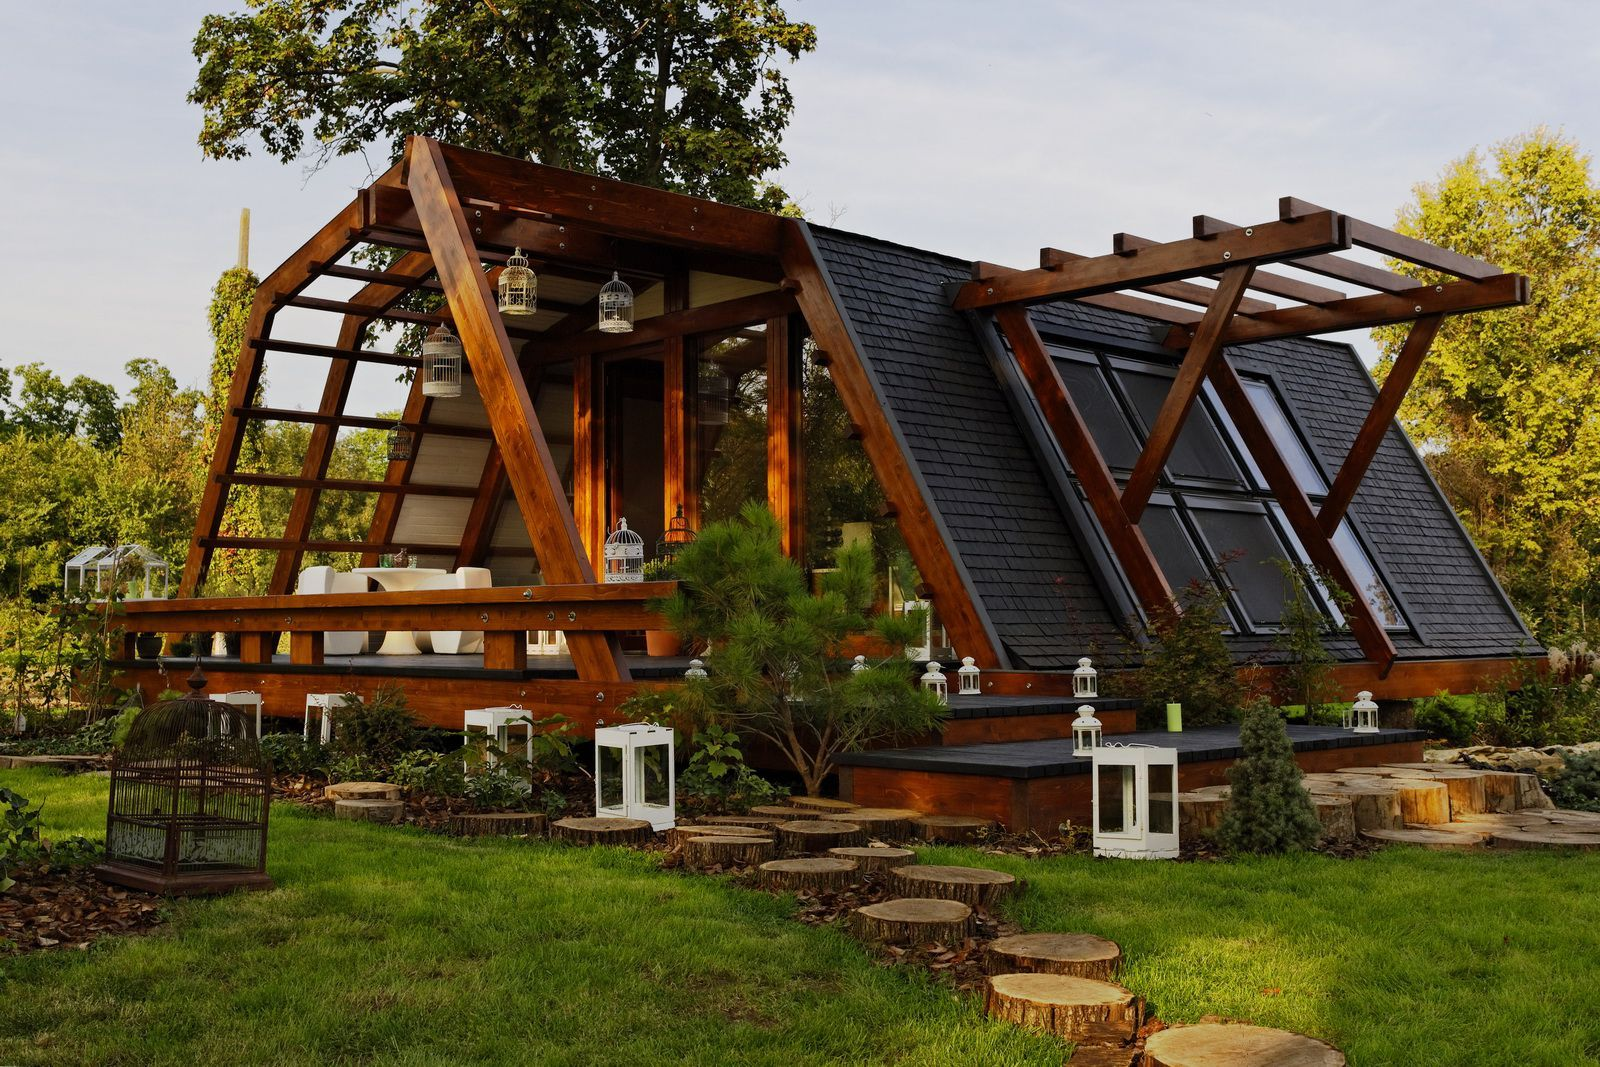 Soleta zeroenergy sustainable wooden house ecologic home dwell ...